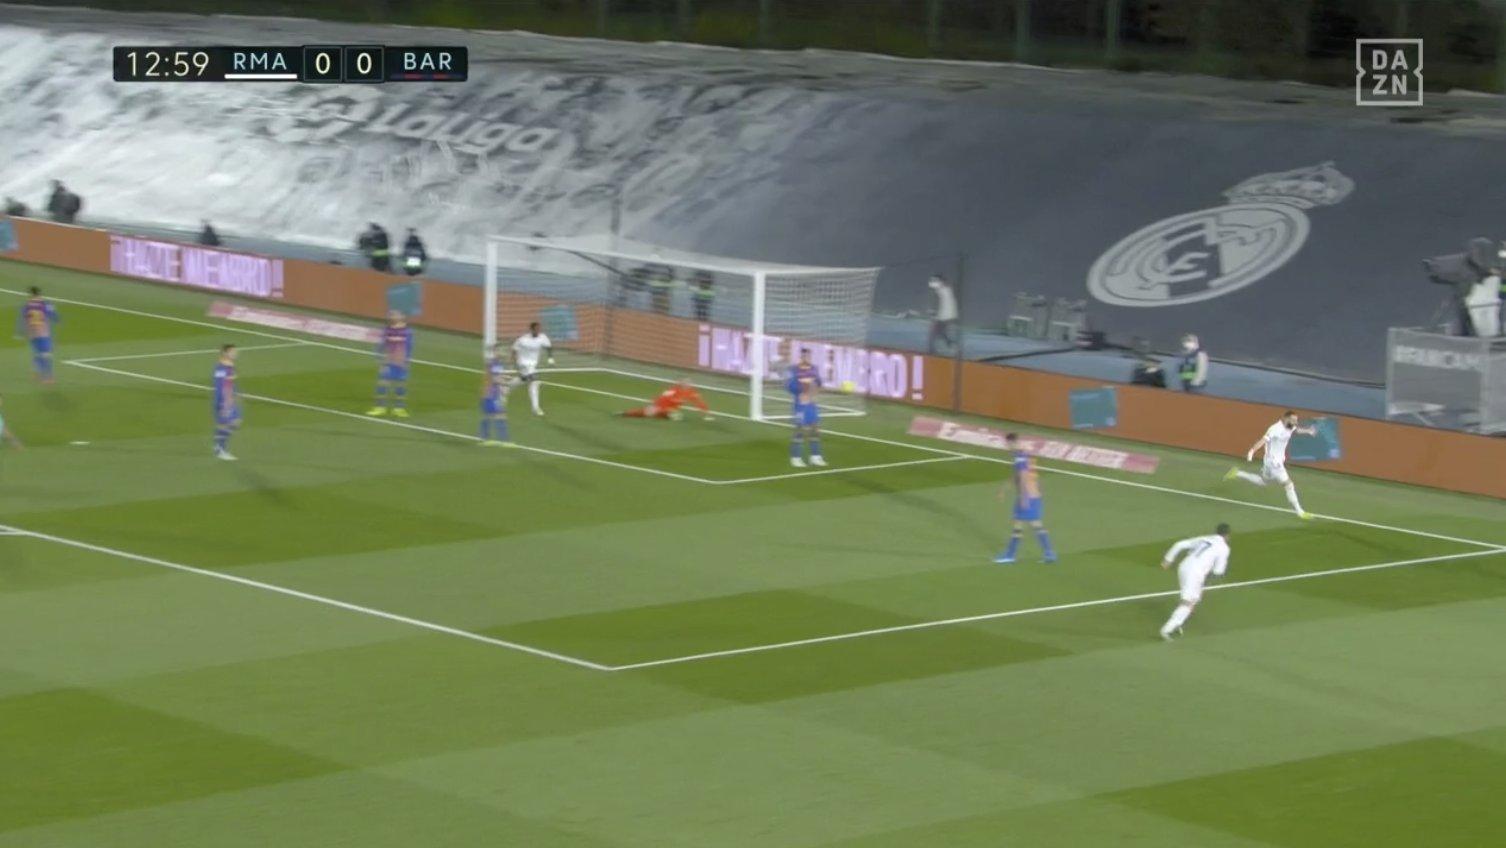 Benzema scores [PHOTO CREDIT: @goal]